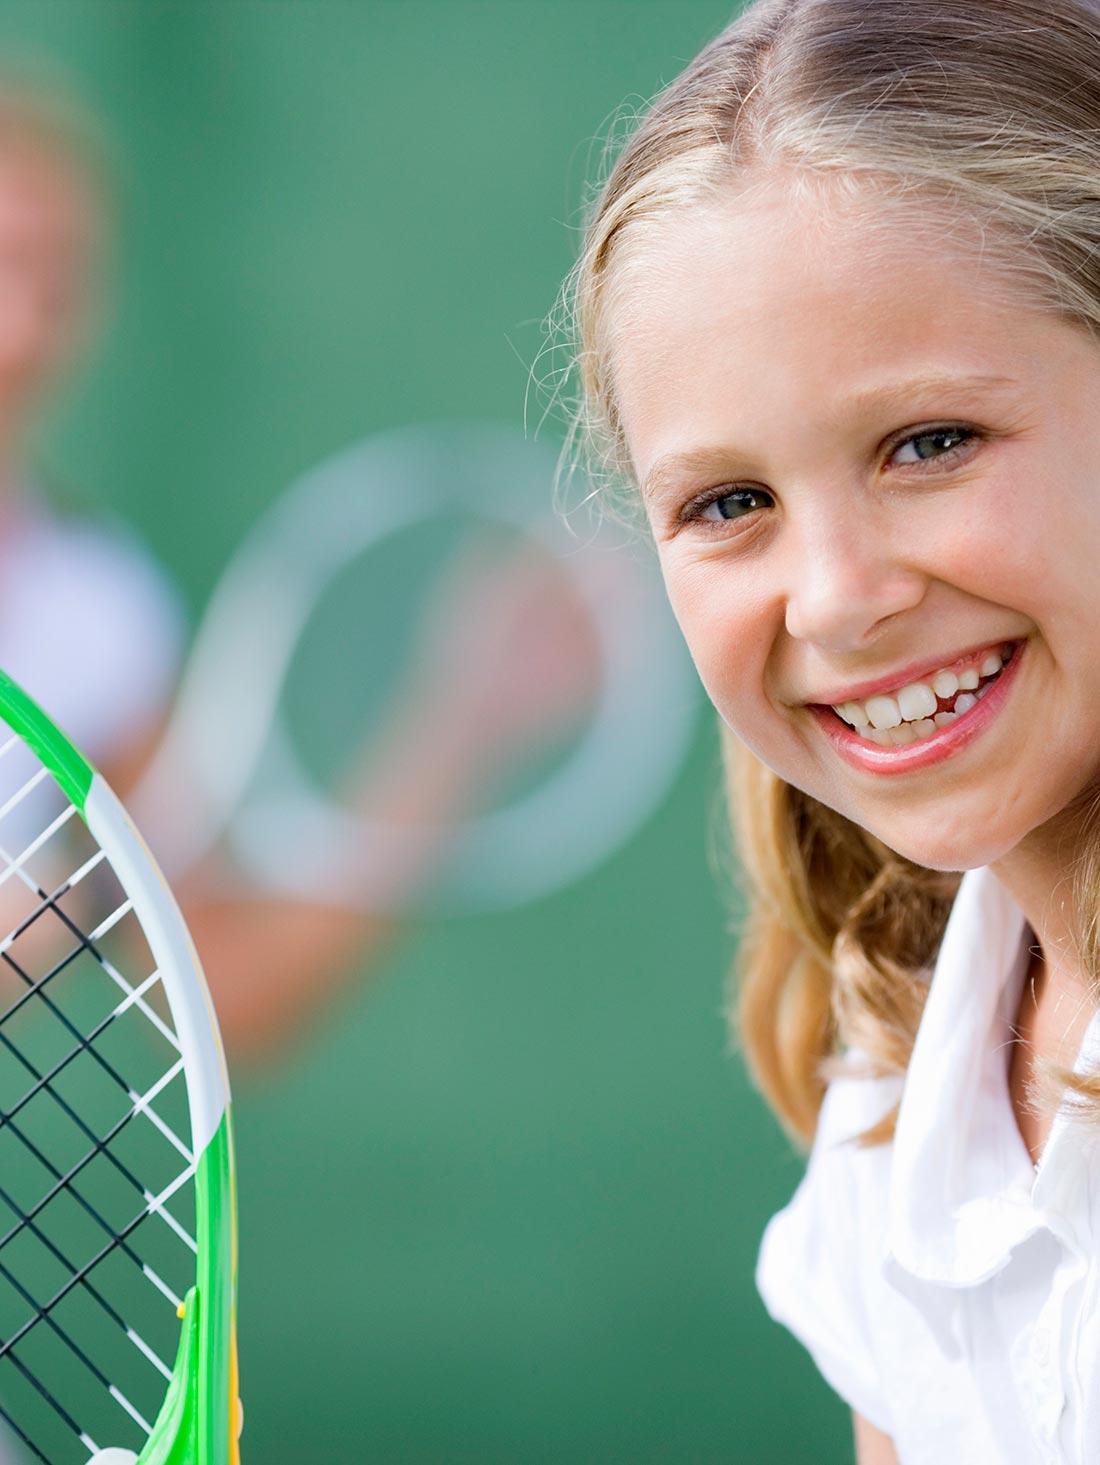 home-corsi-tennis-ragazzi.jpg